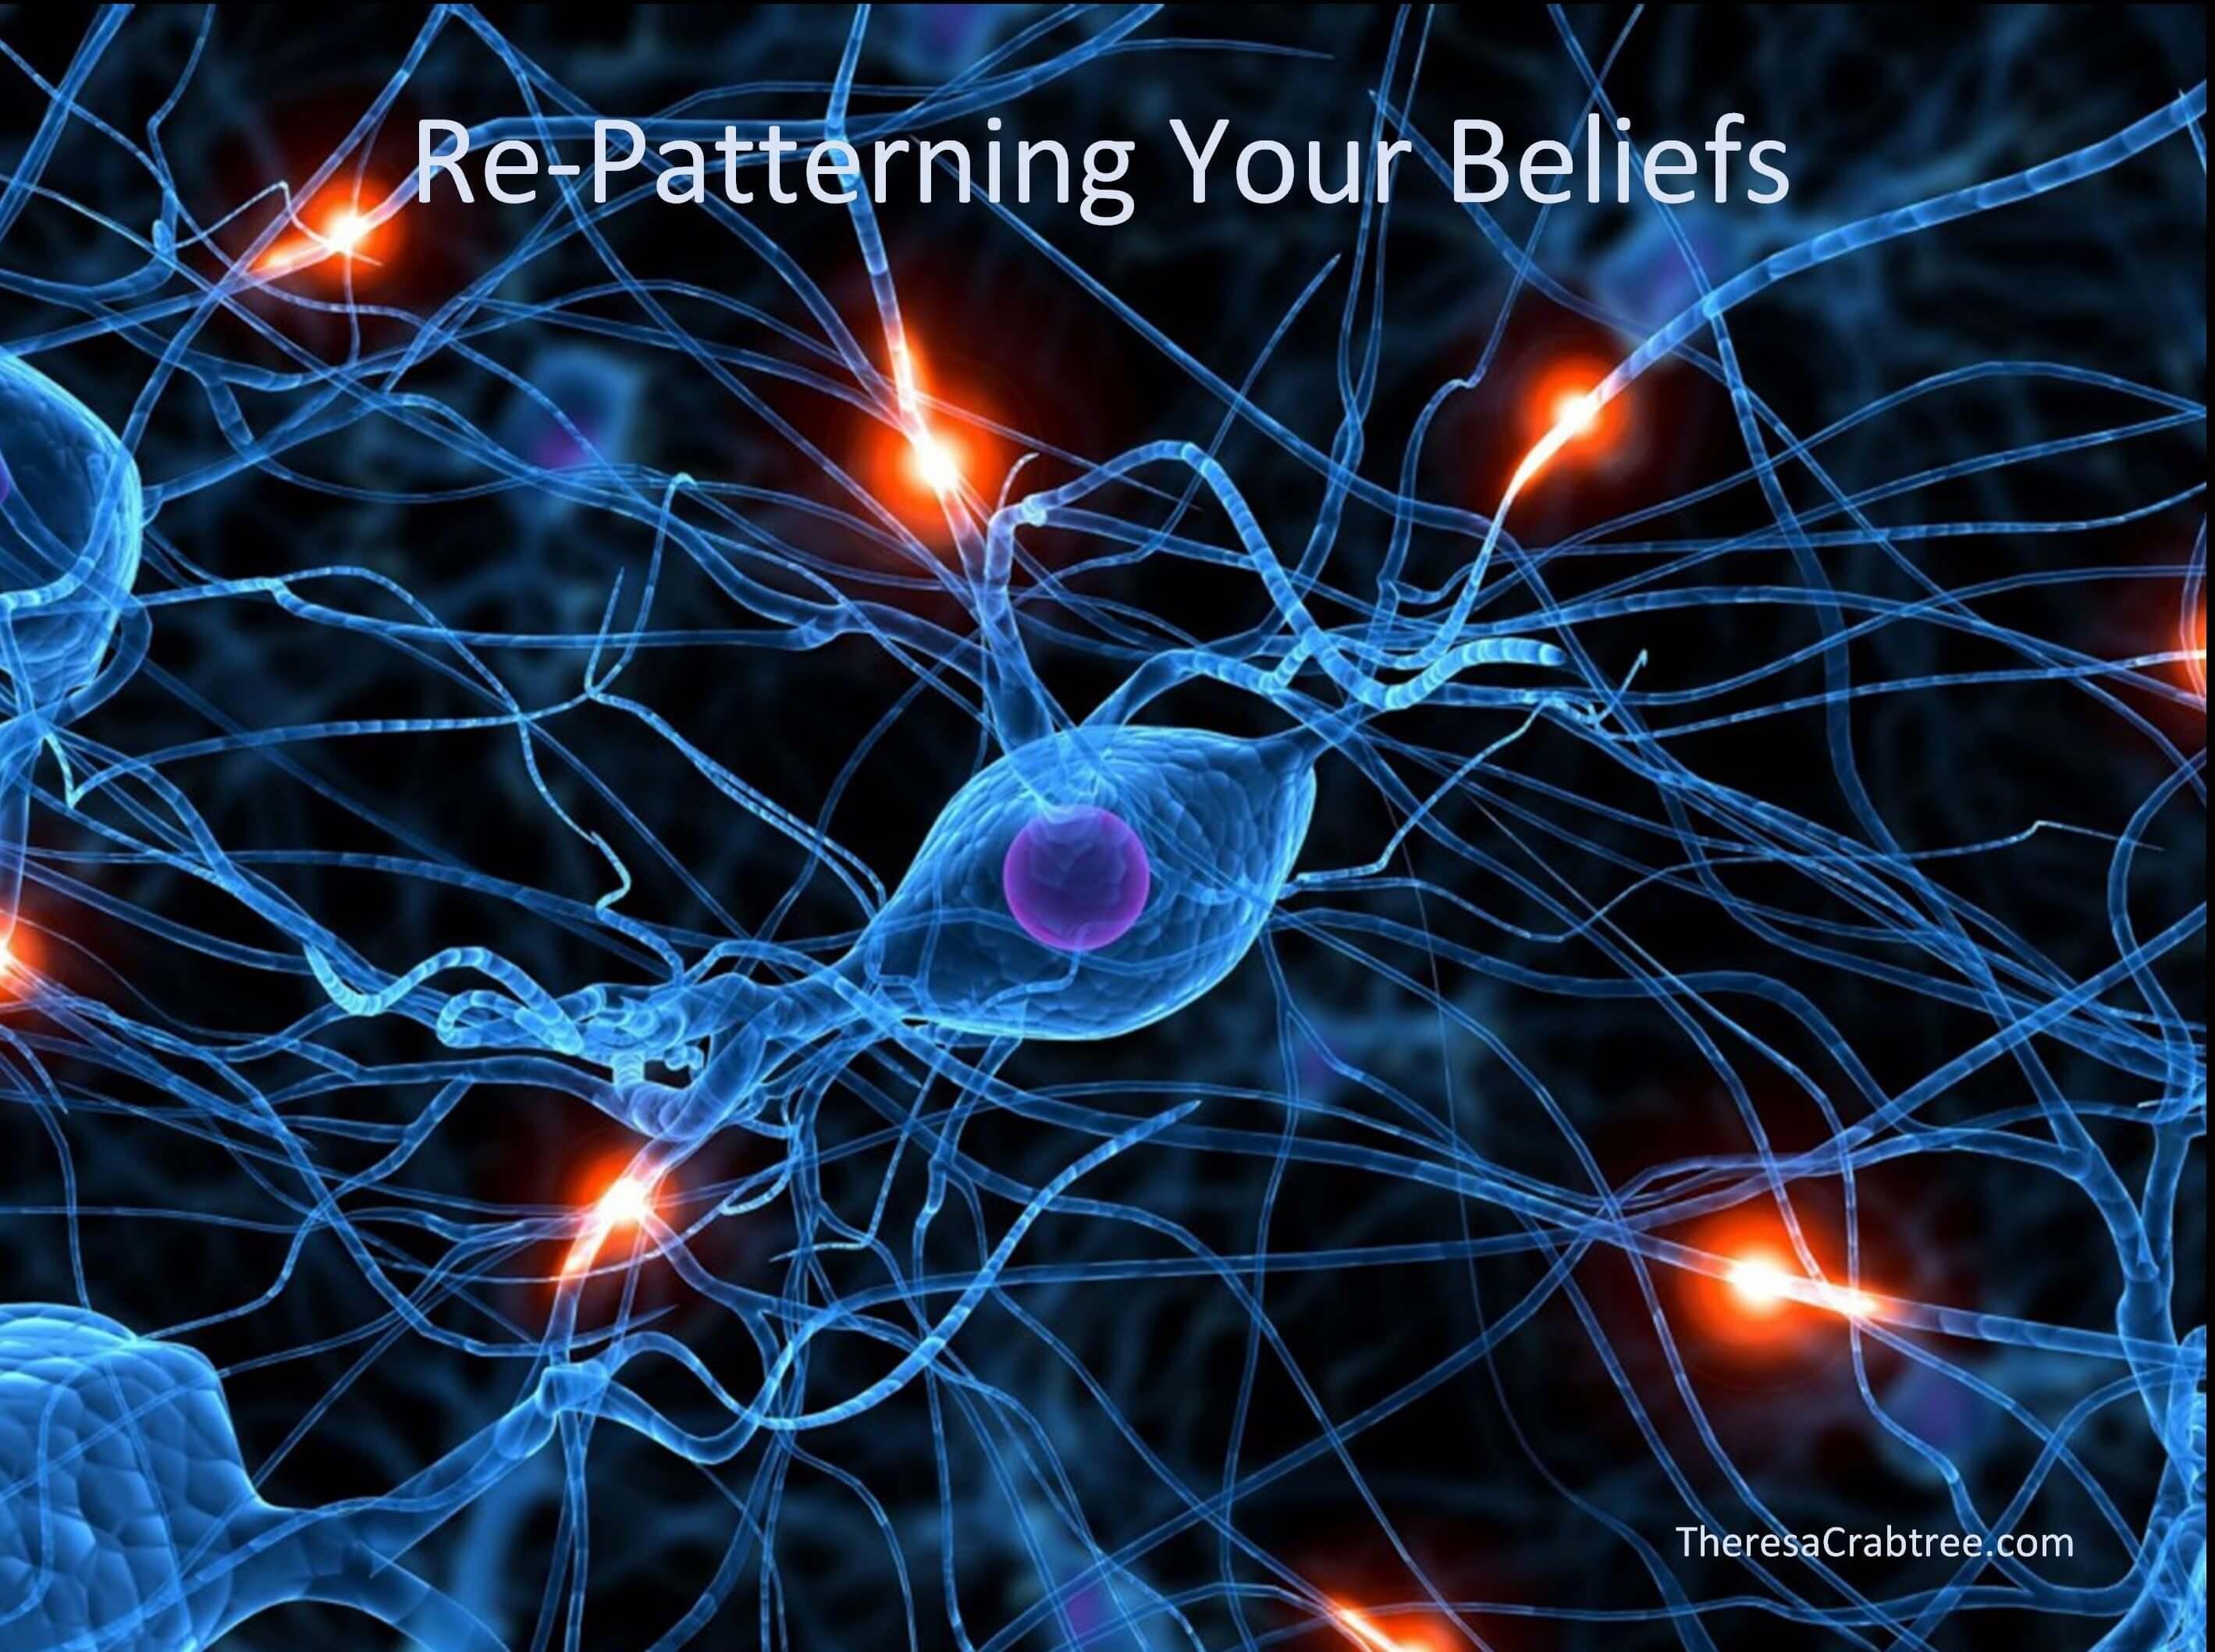 Re-Patterning Your Beliefs